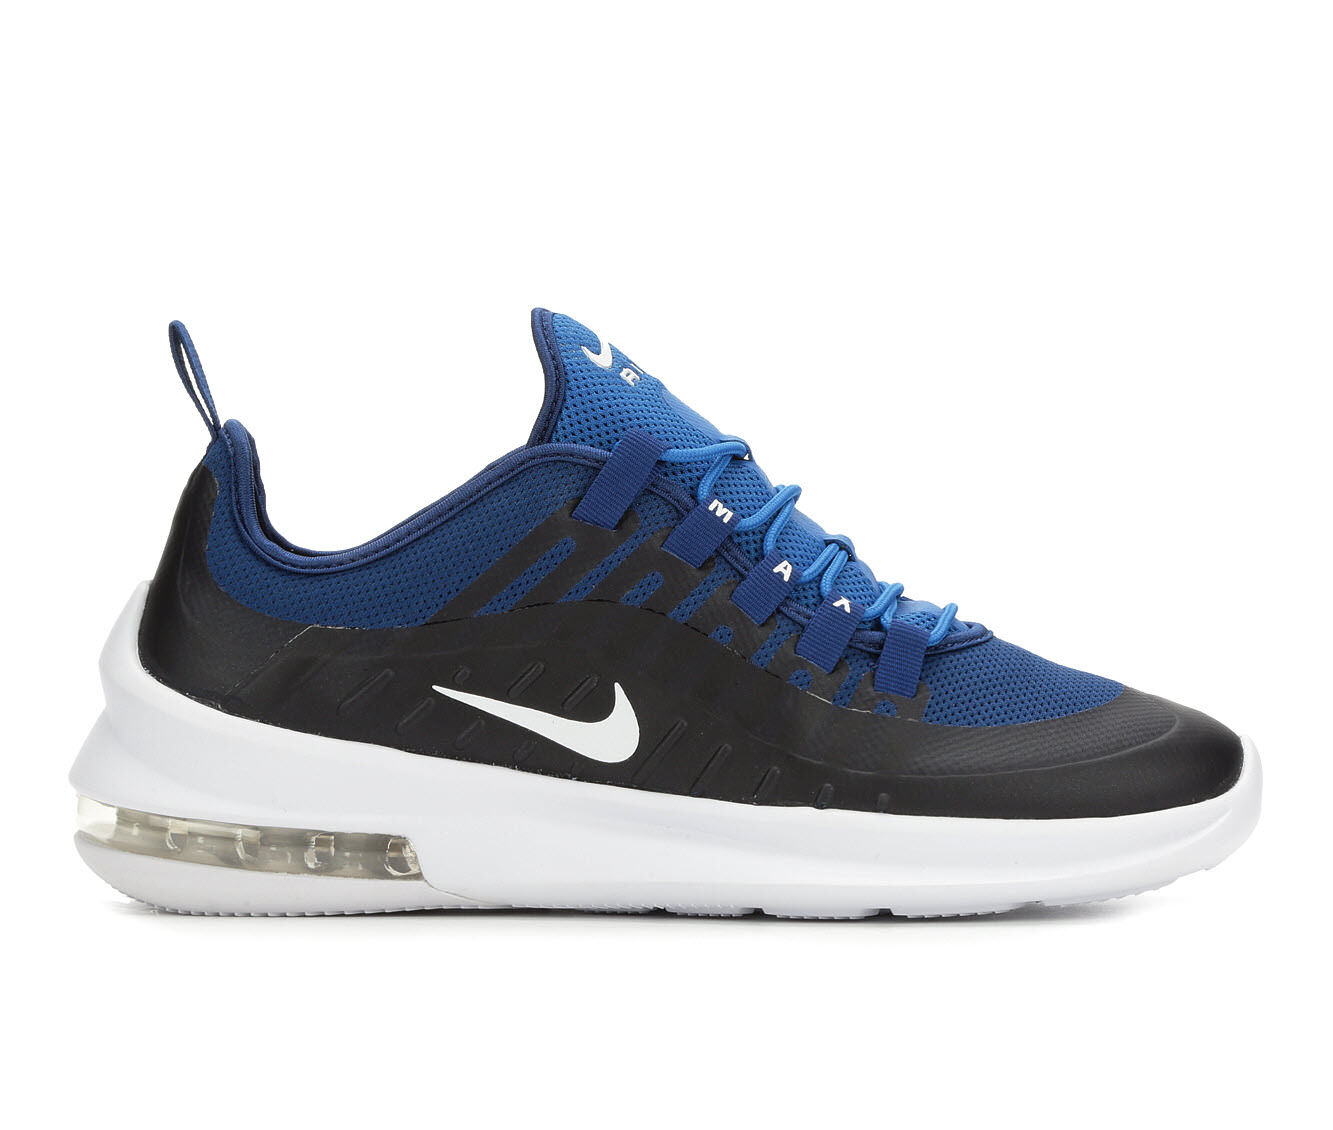 Men's Nike Air Max Axis Running Shoes Blu/White/Black